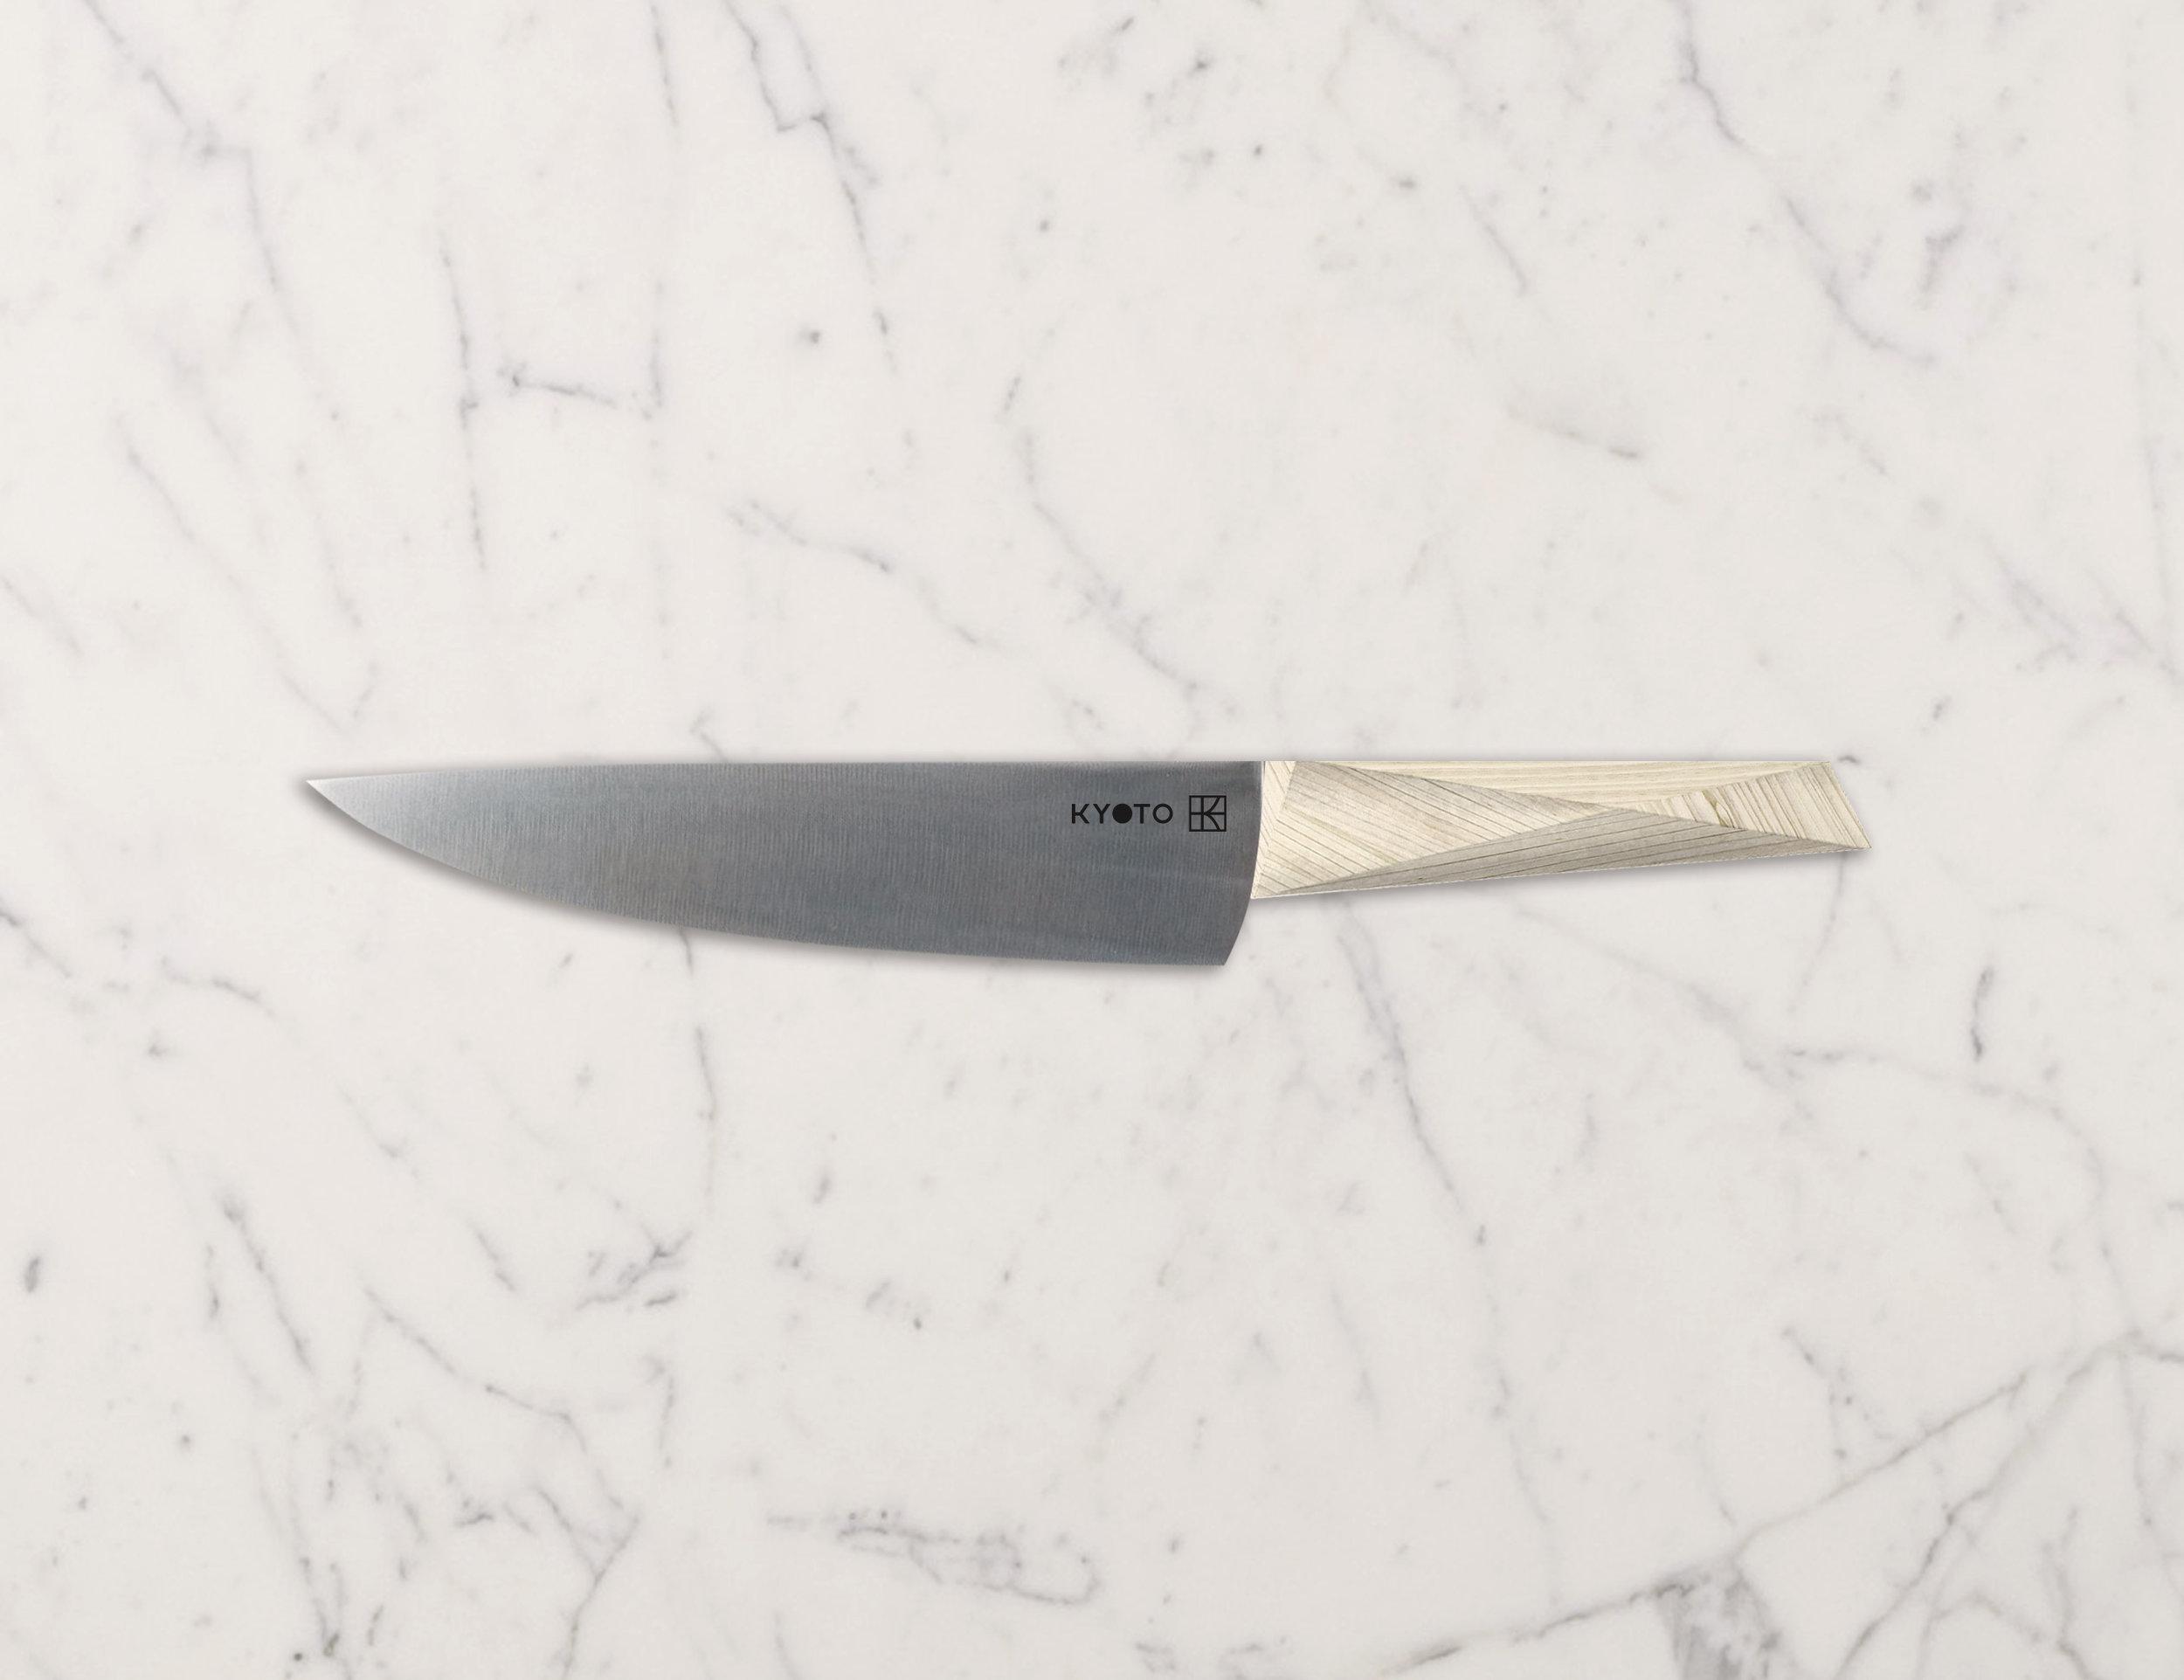 Kyoto_Knife1.jpg